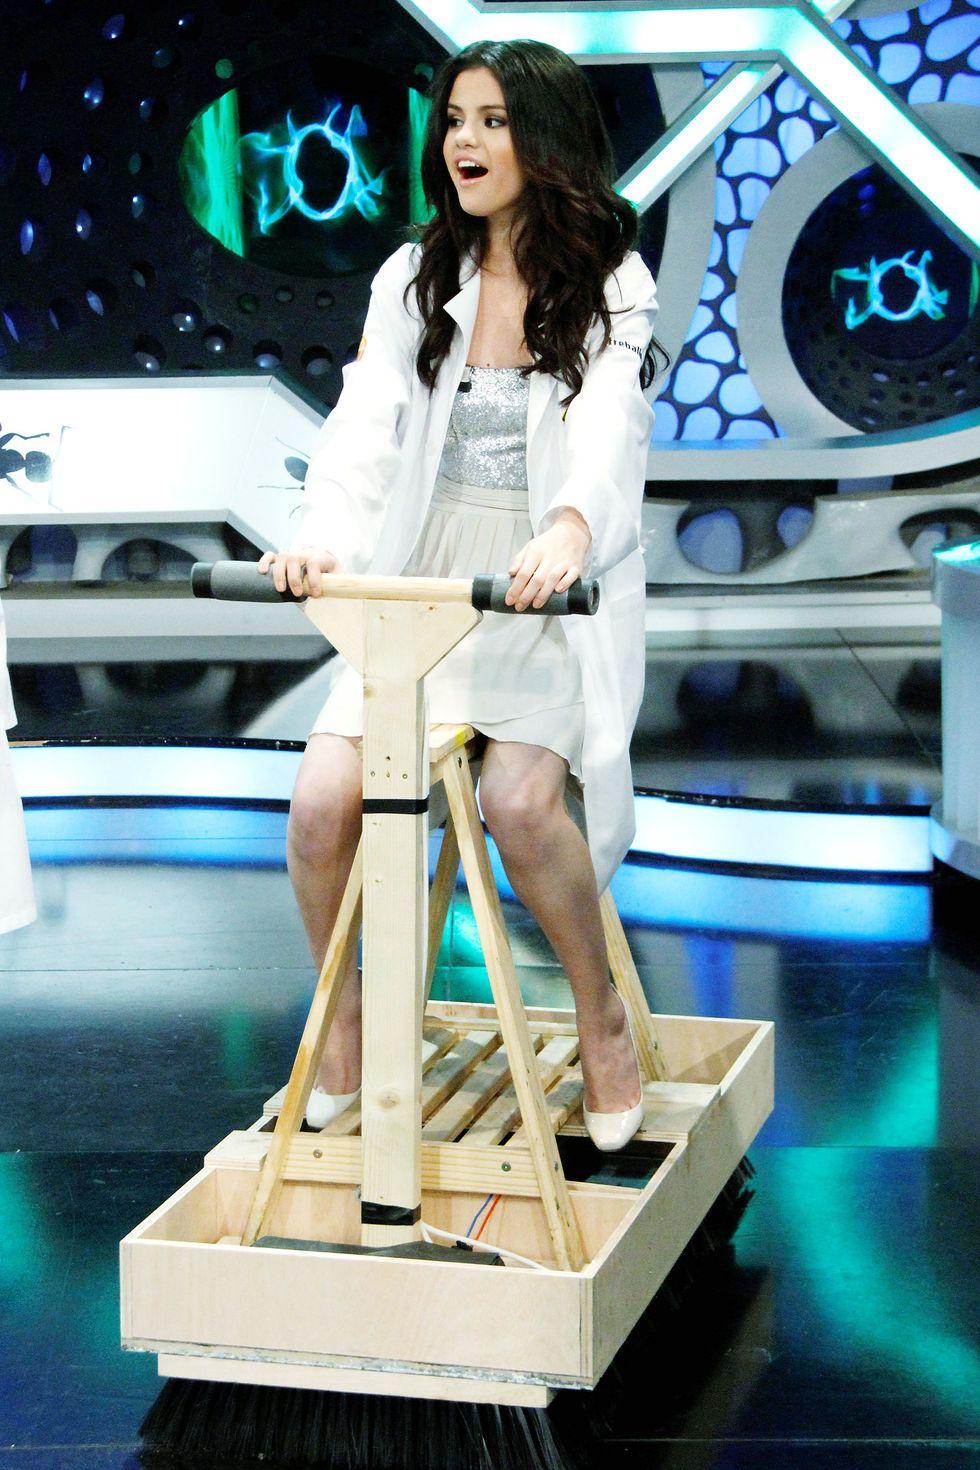 Selena Gomez 2010 : selena-gomez-el-hormiguero-tv-show-stills-hq-07